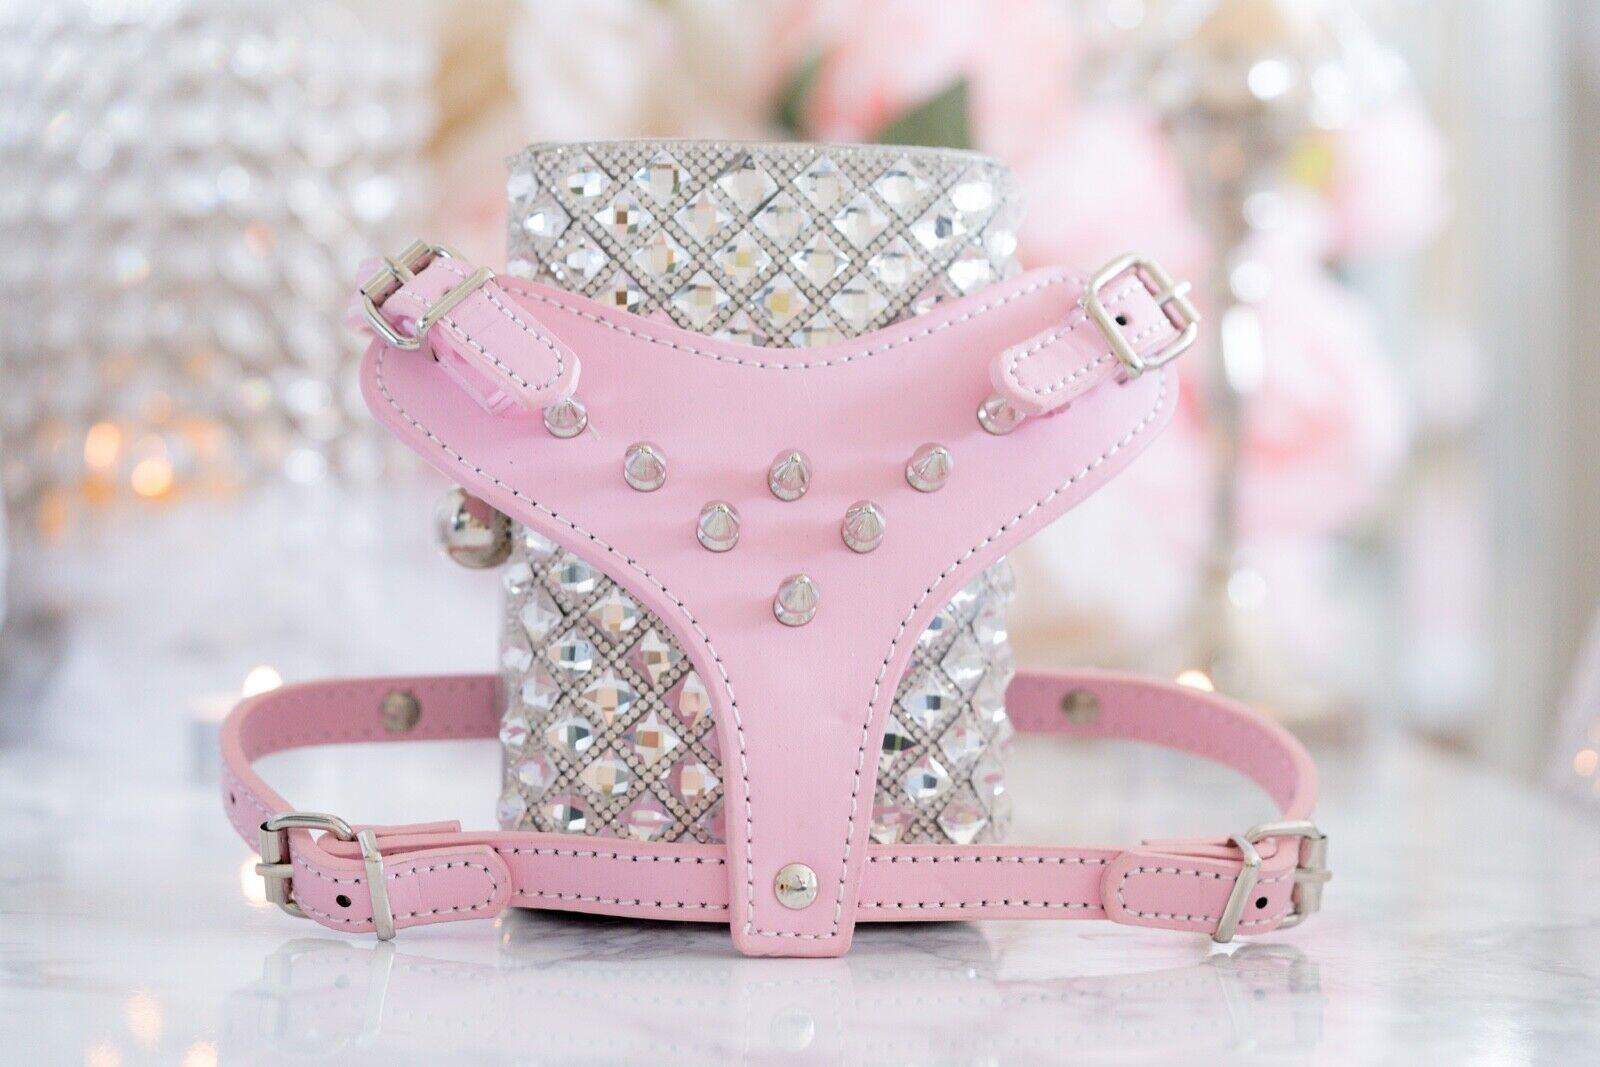 per offrirti un piacevole shopping online NEW  Luxury Vegan rosa Spike Pet Harness & & & Leash Set - Dogs, Cats, Pets  colorways incredibili